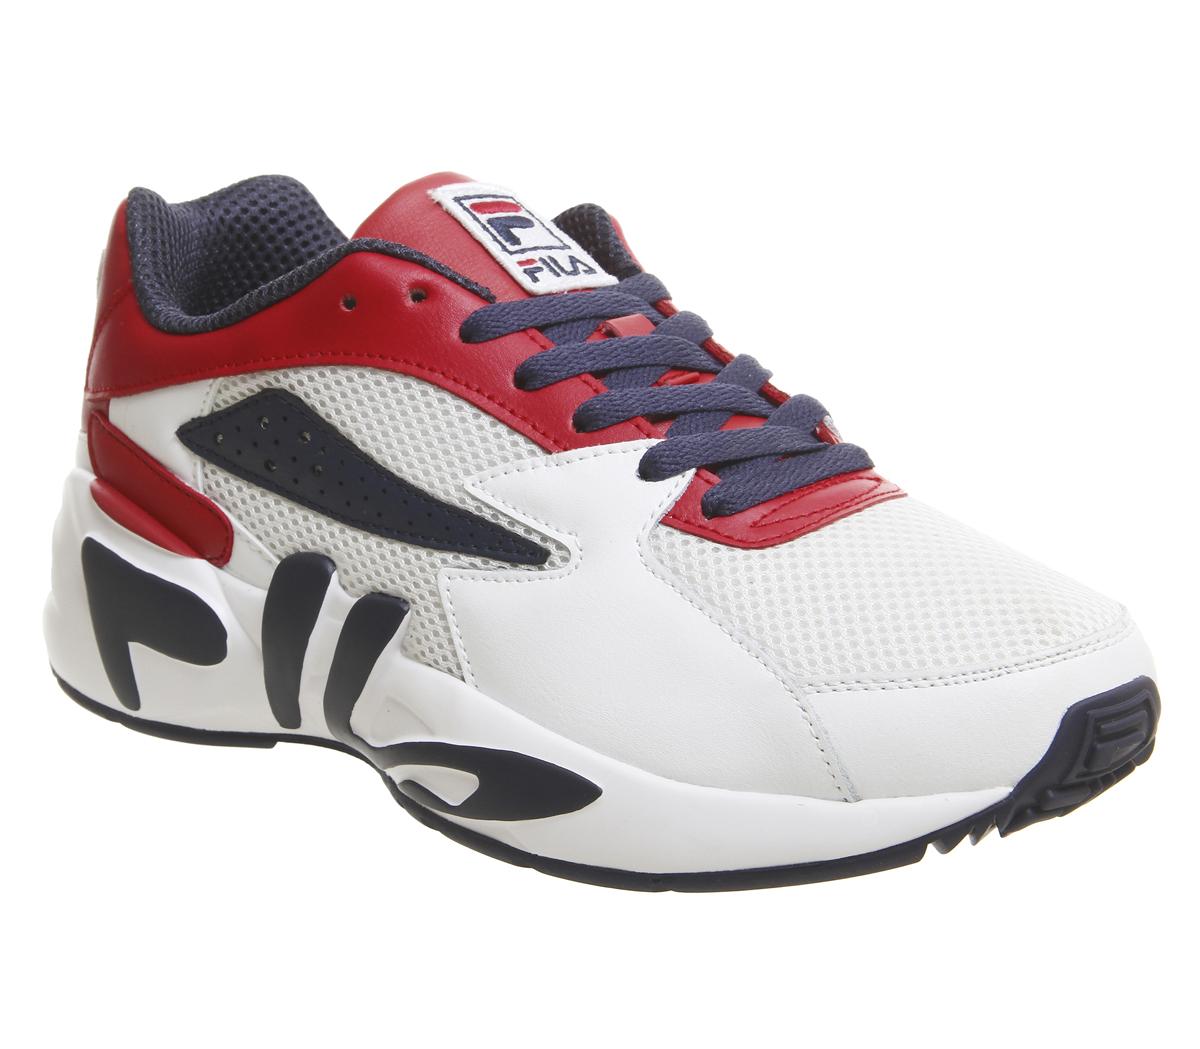 buy popular 59427 e82a7 CENTINELA Fila Mindblower instructores formadores marino rojo blanco zapatos